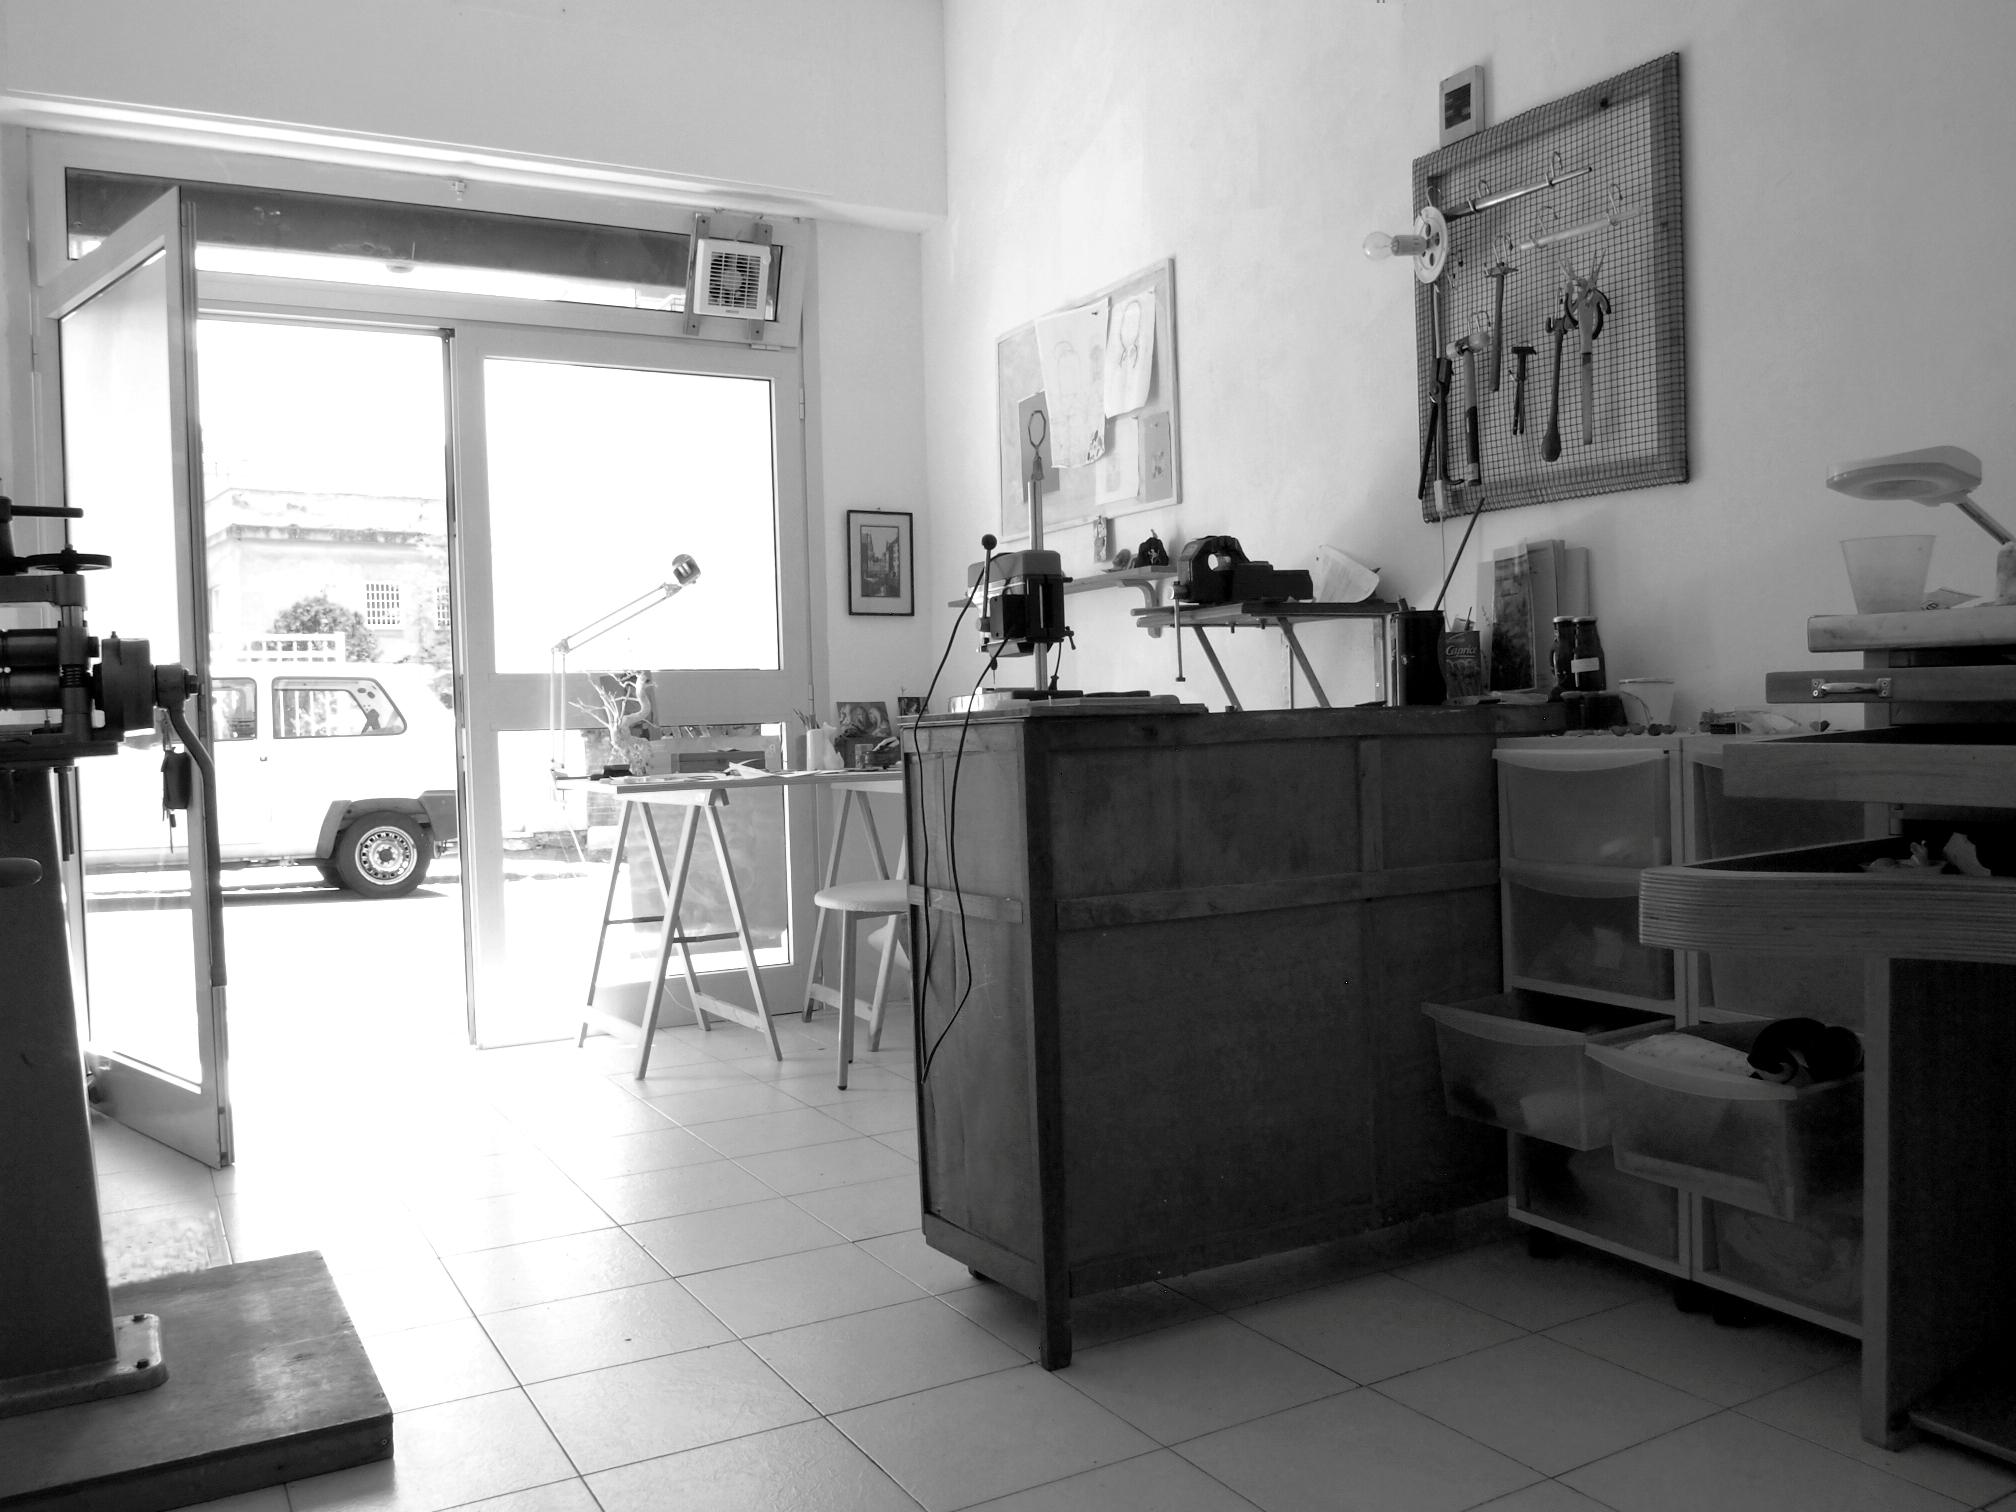 Atelier Francesca di Ciaula. Foto met dank aan Francesca di Ciaula©